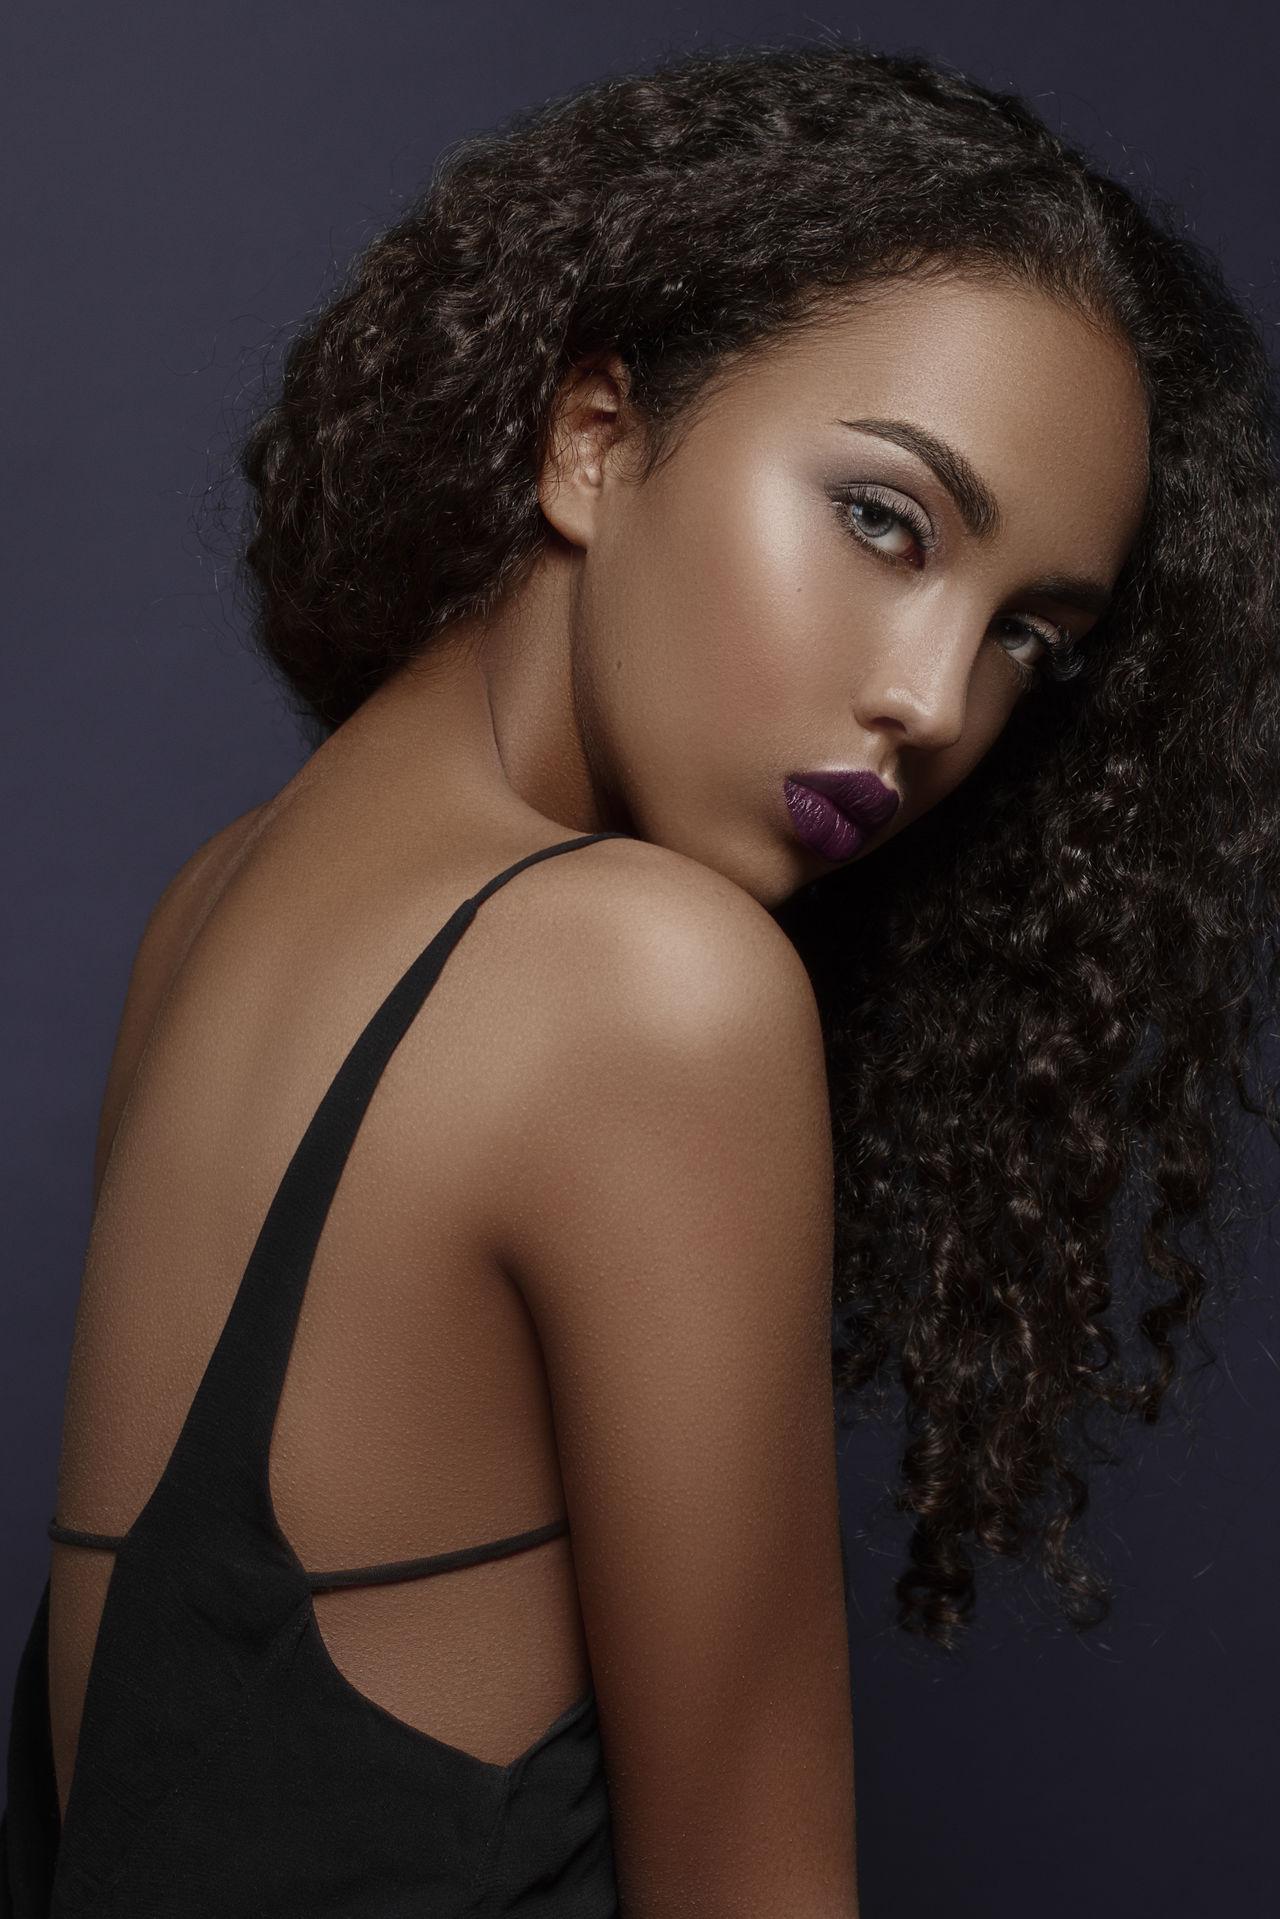 Beautiful stock photos of lippen, studio shot, portrait, beautiful woman, beauty